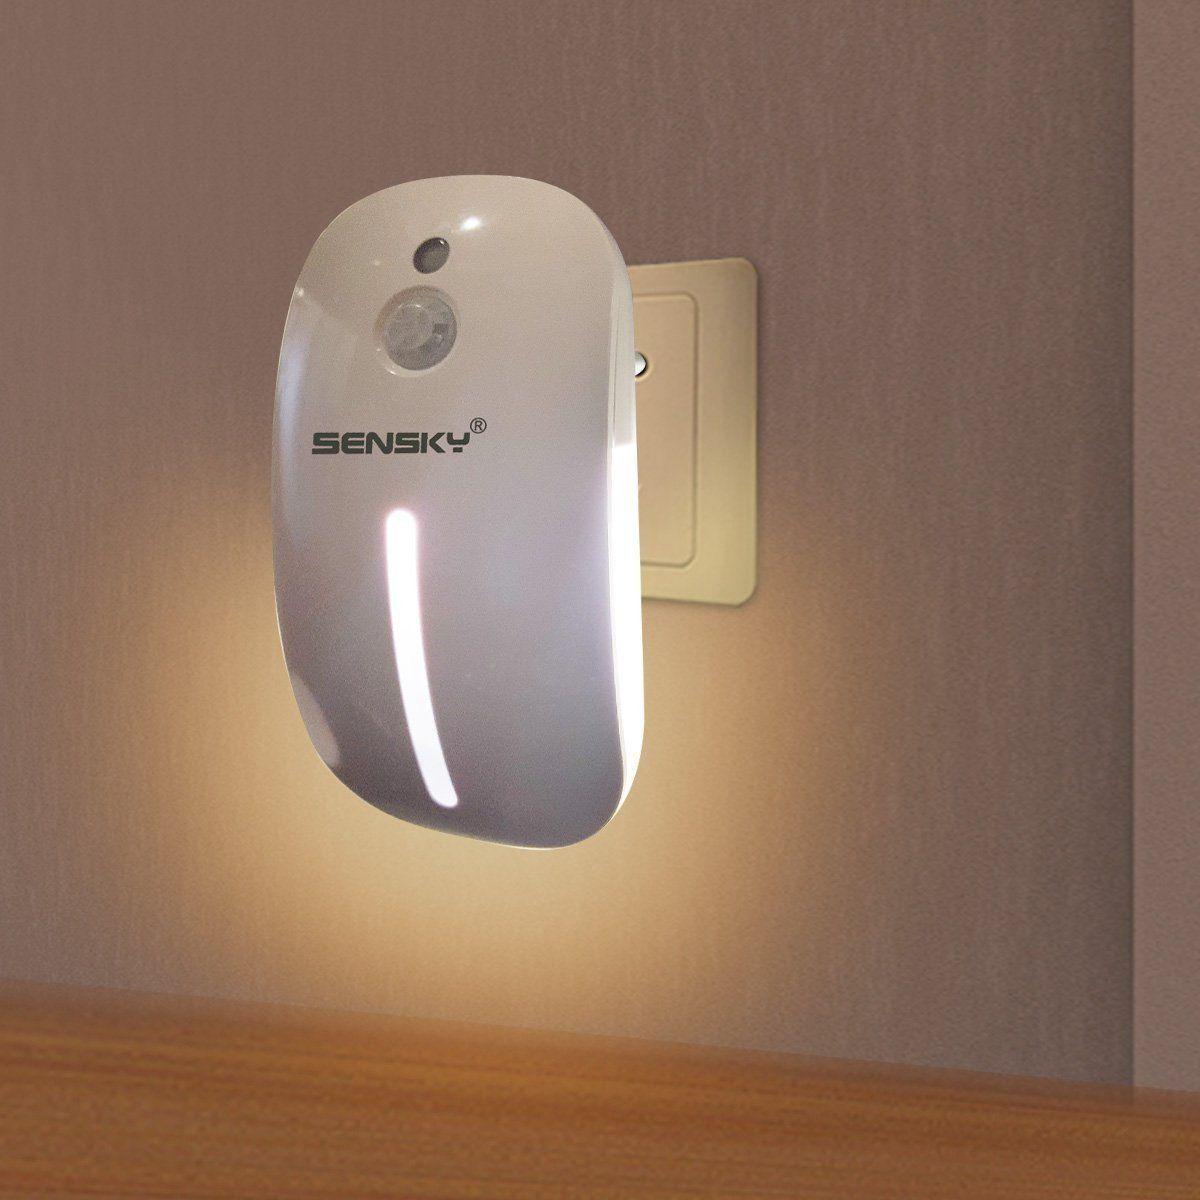 Sensky Skl001 Plug in Motion Sensor Light